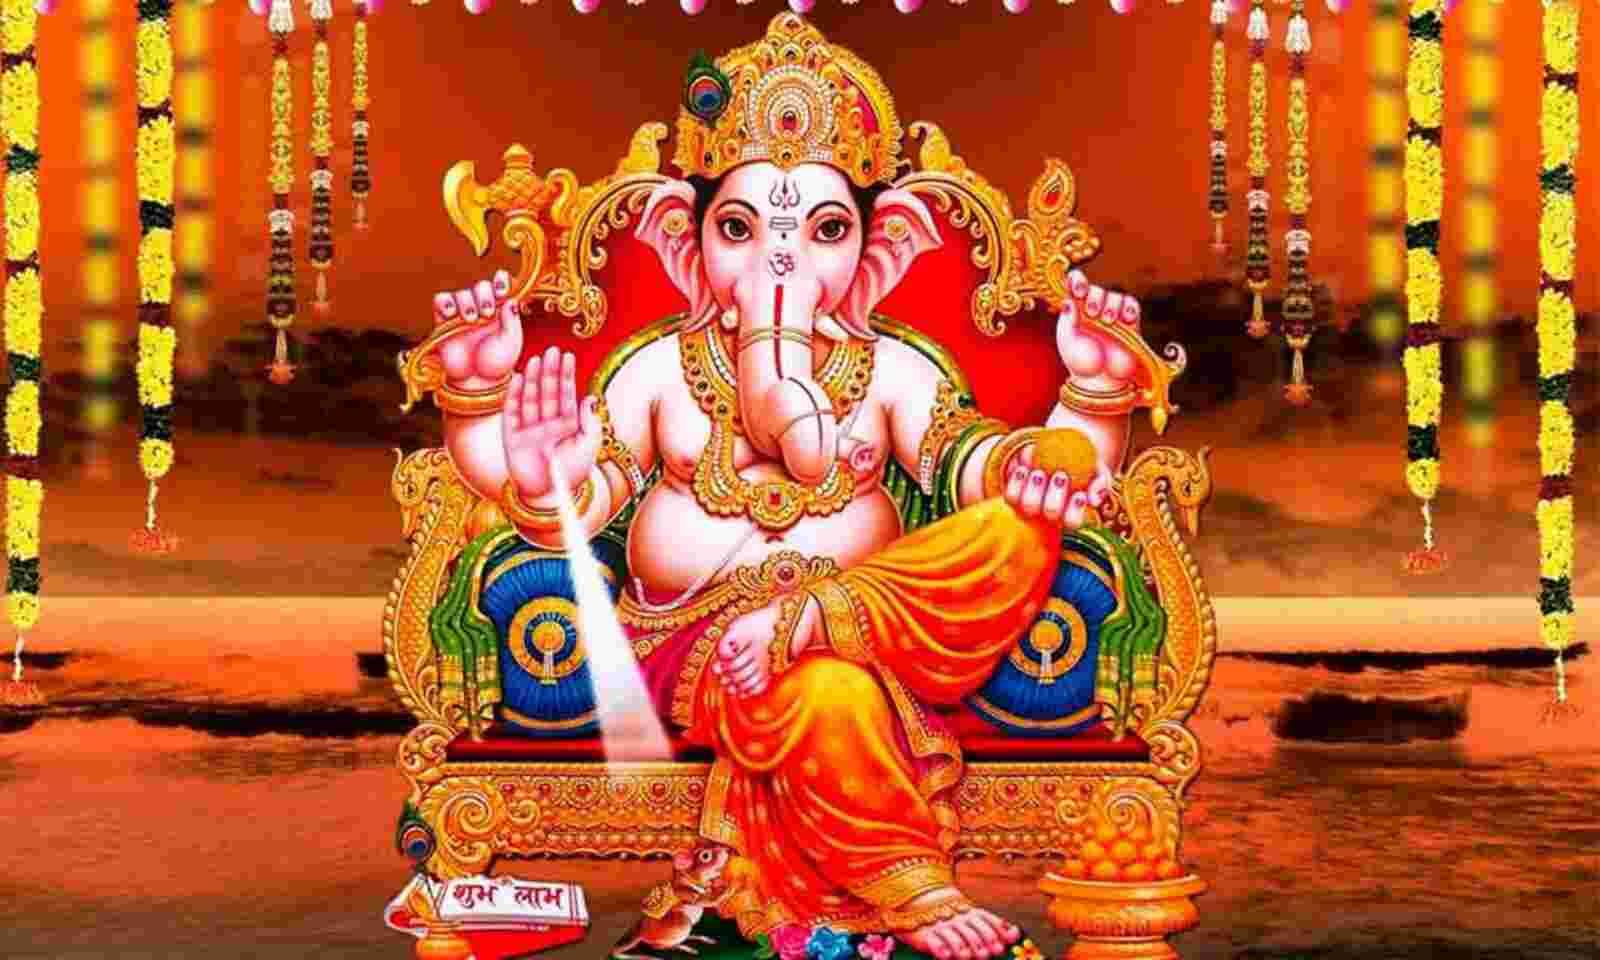 Ganesh Chaturthi: The Importance of Durva Grass to Worship Lord Ganesha